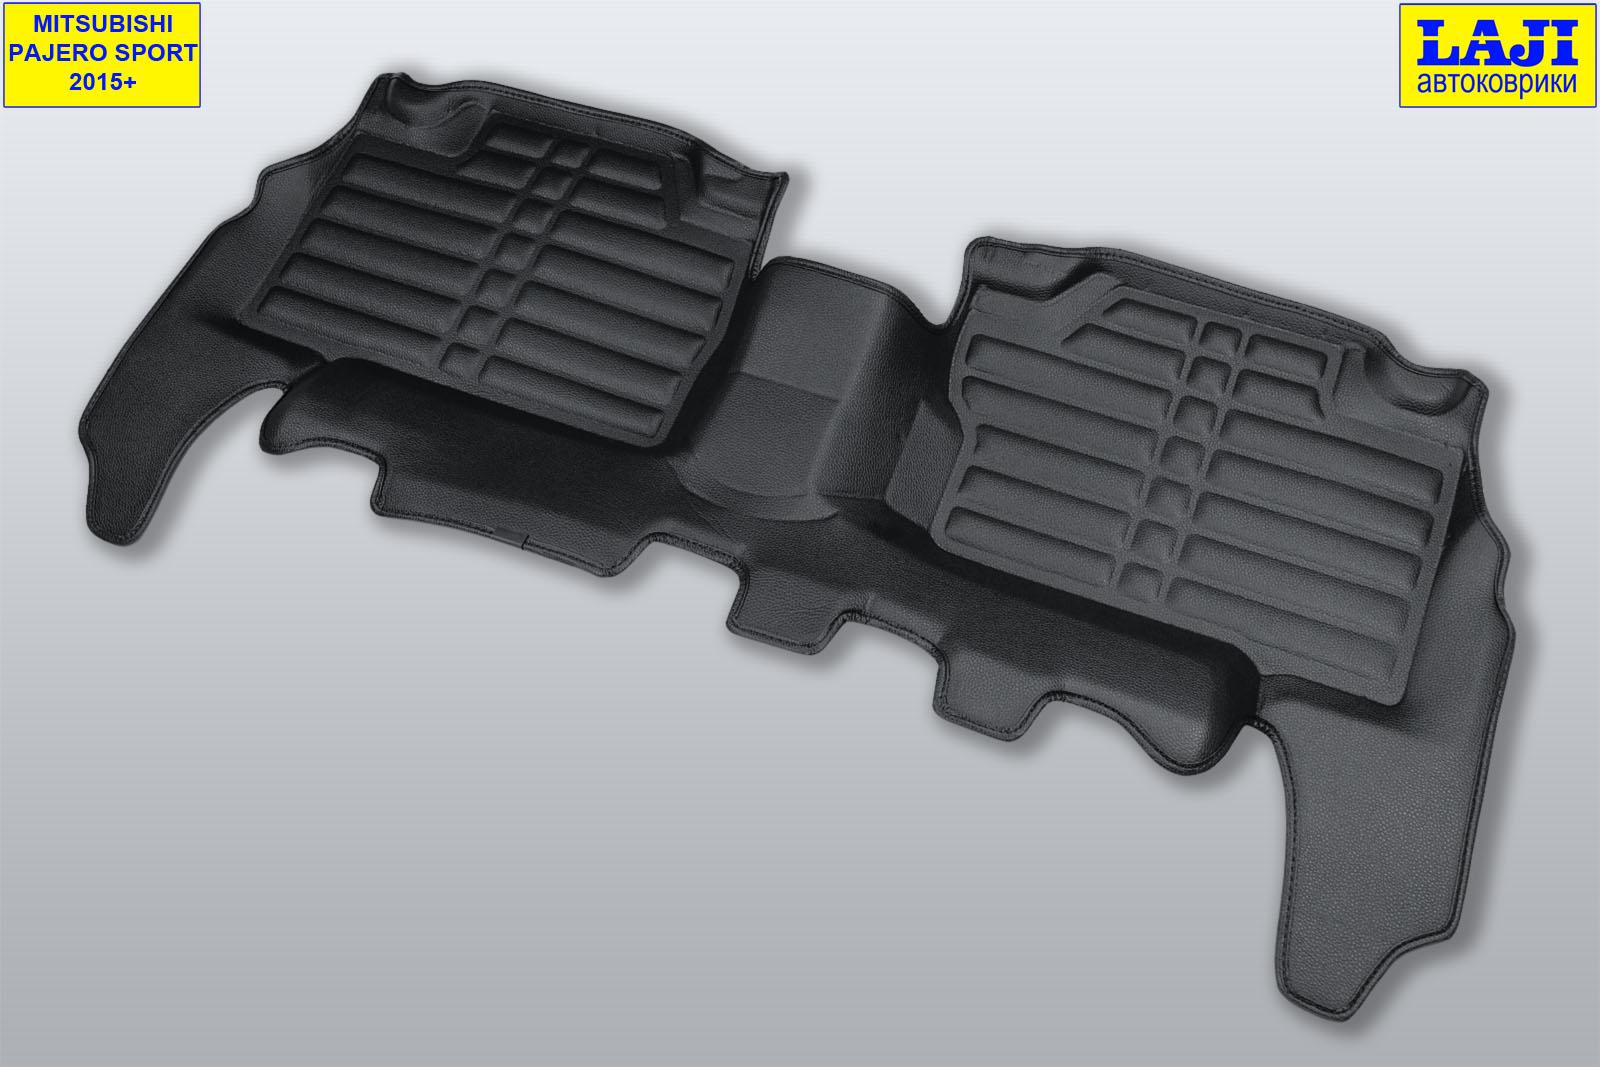 5D коврики в салон Mitsubishi Pajero Sport III 2015-н.в. 7